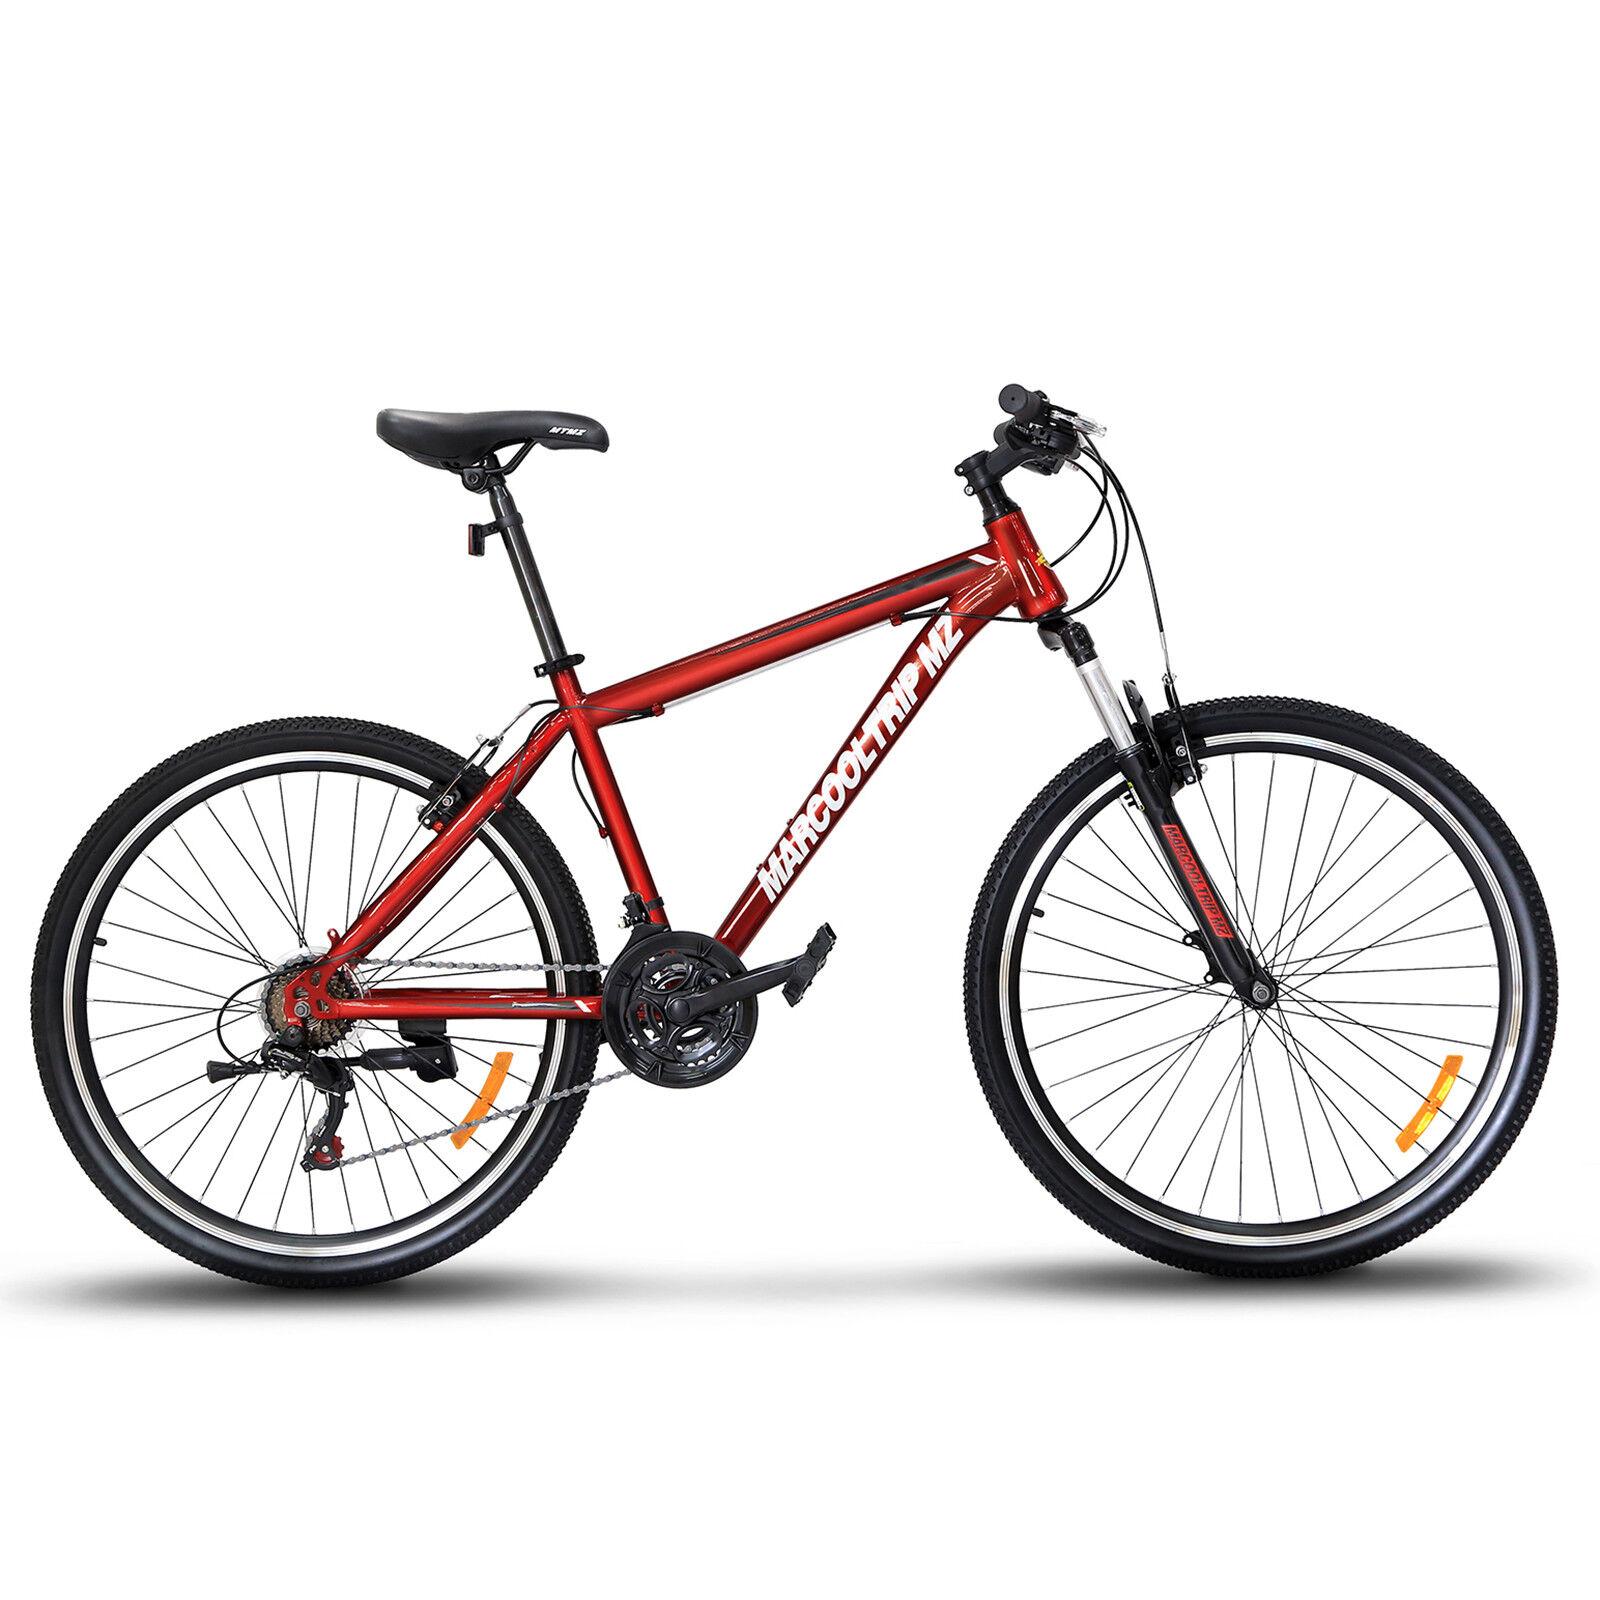 27.5  Men's Mountain Bike Hybrid 21 Speed Front Suspension Shimano Bicycle Red